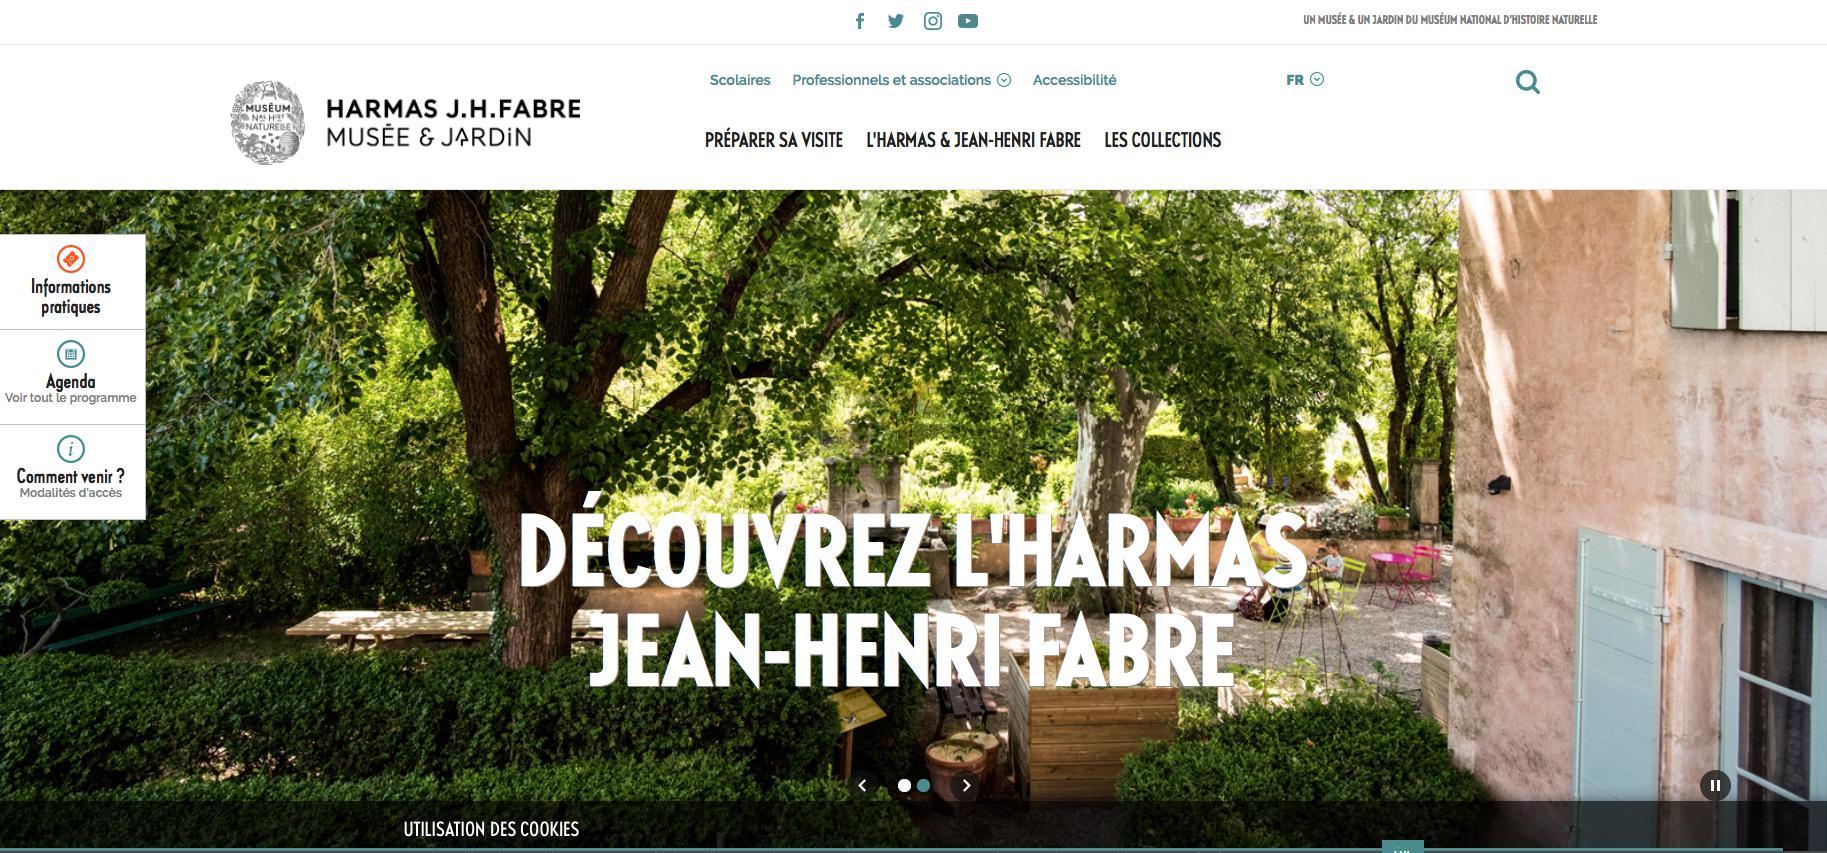 Le-Harmas-J-H-Fabre-partenaire-de-Taxi-Massilia